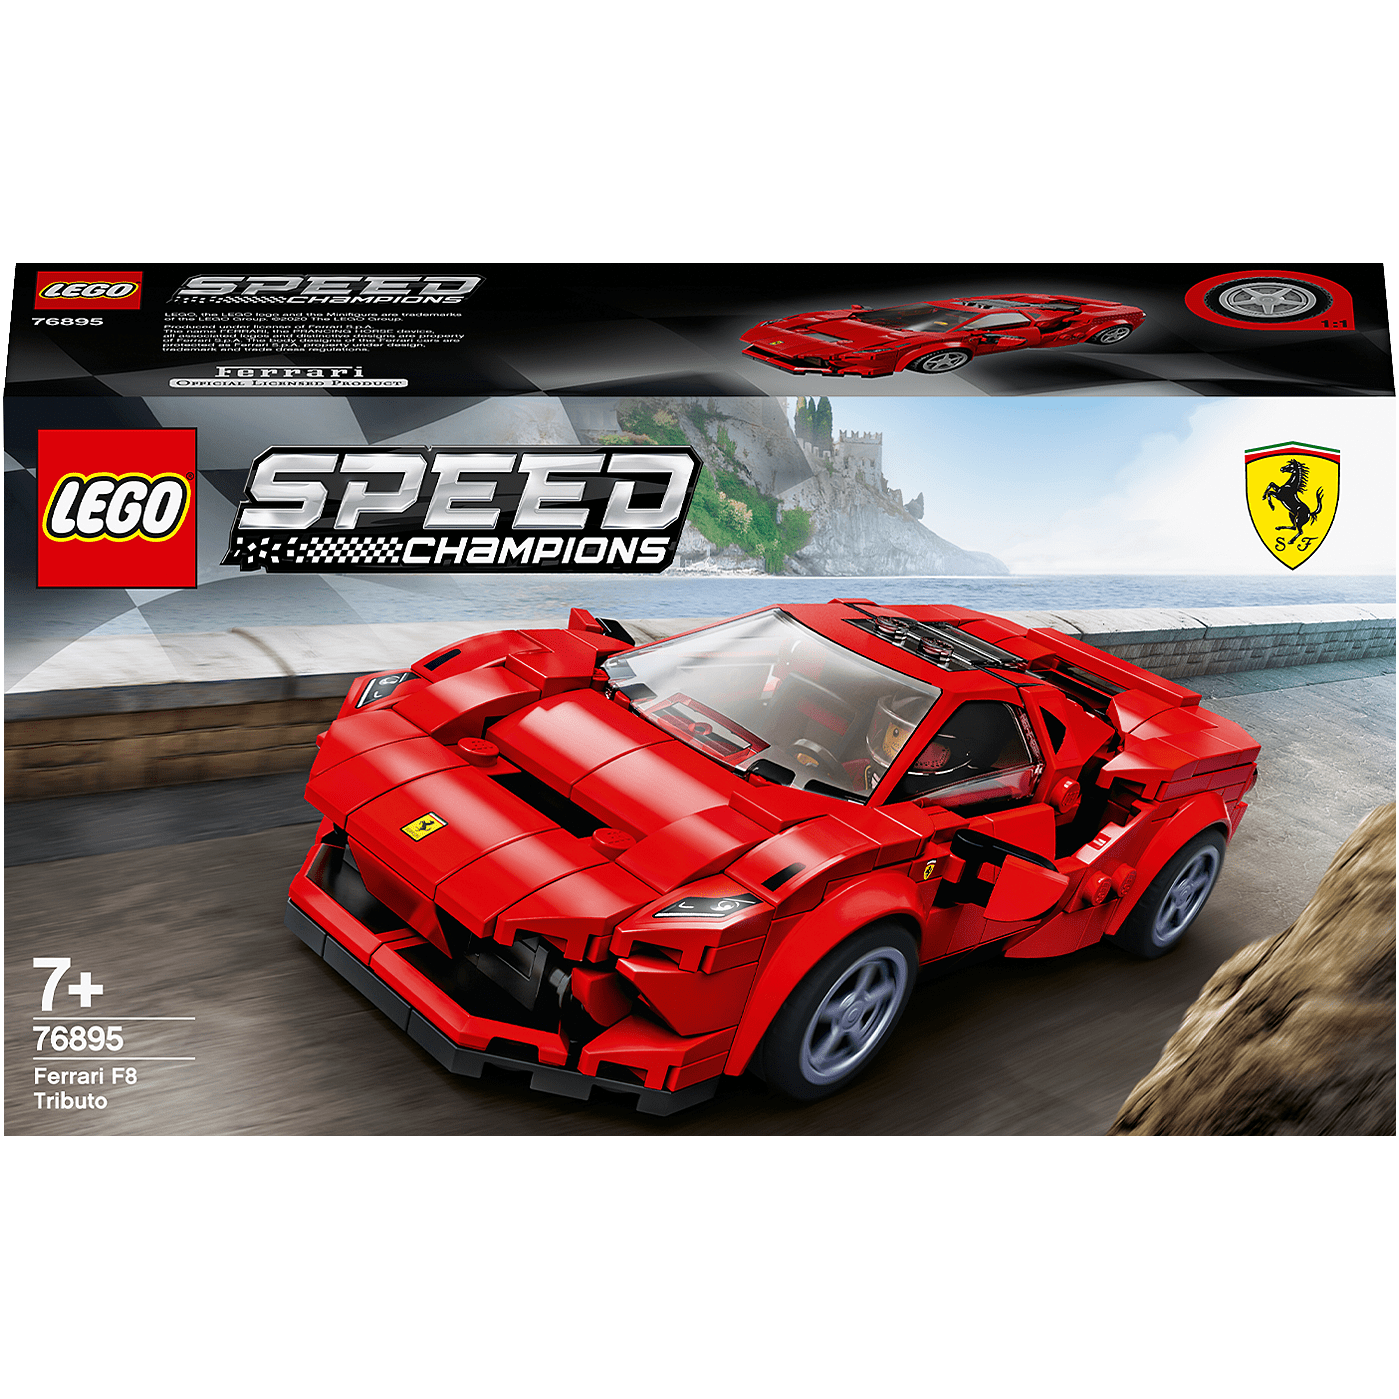 Ferrari Tributo V8: Buy LEGO 76895 Speed Champions: Ferrari F8 Tributo Race